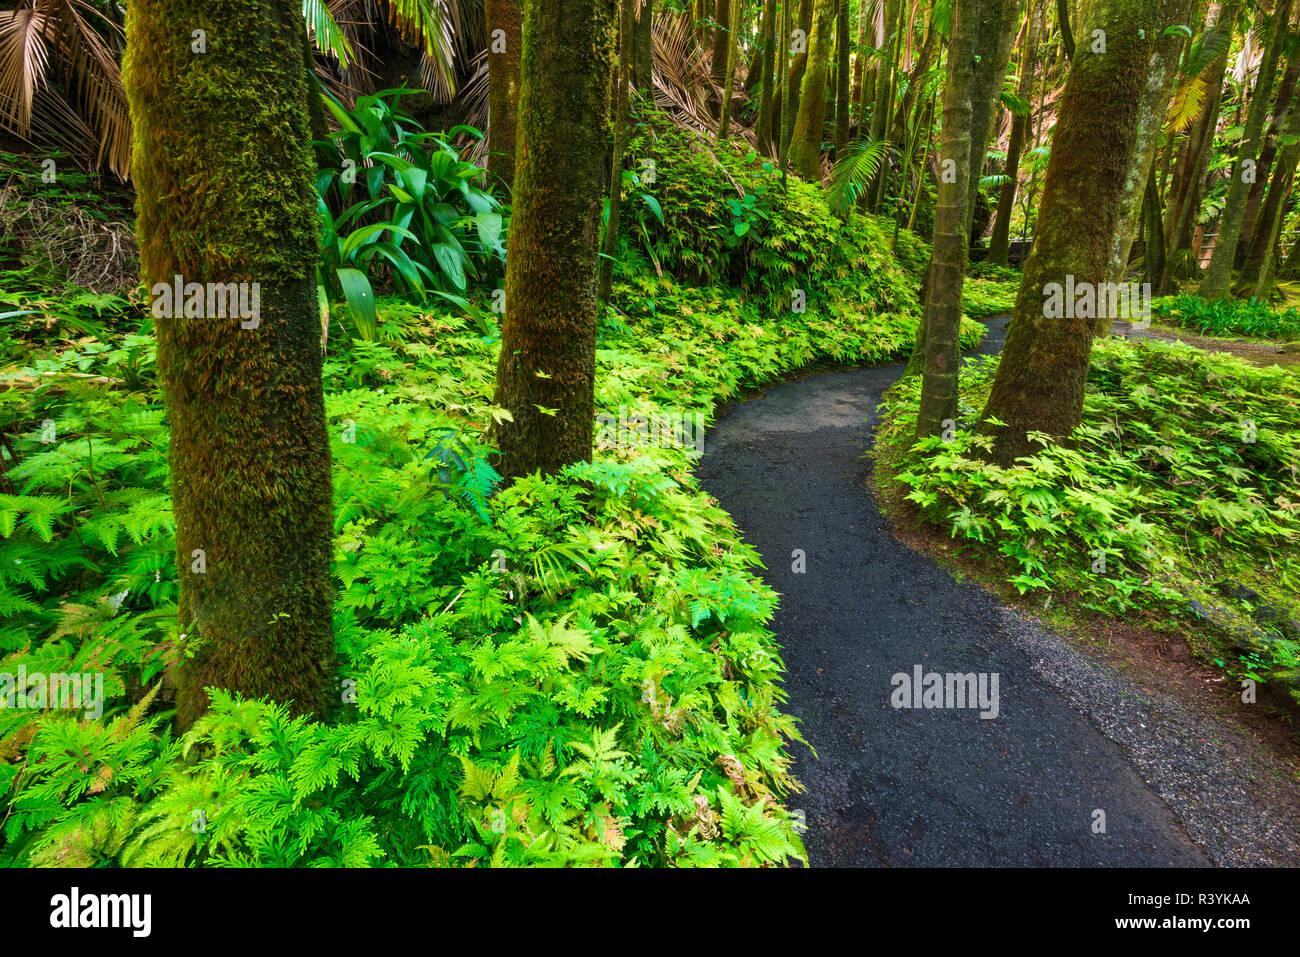 Palm Jungle Trail en Hawai jardín botánico tropical, Costa Hamakua, Big Island, Hawaii, EE.UU. Foto de stock